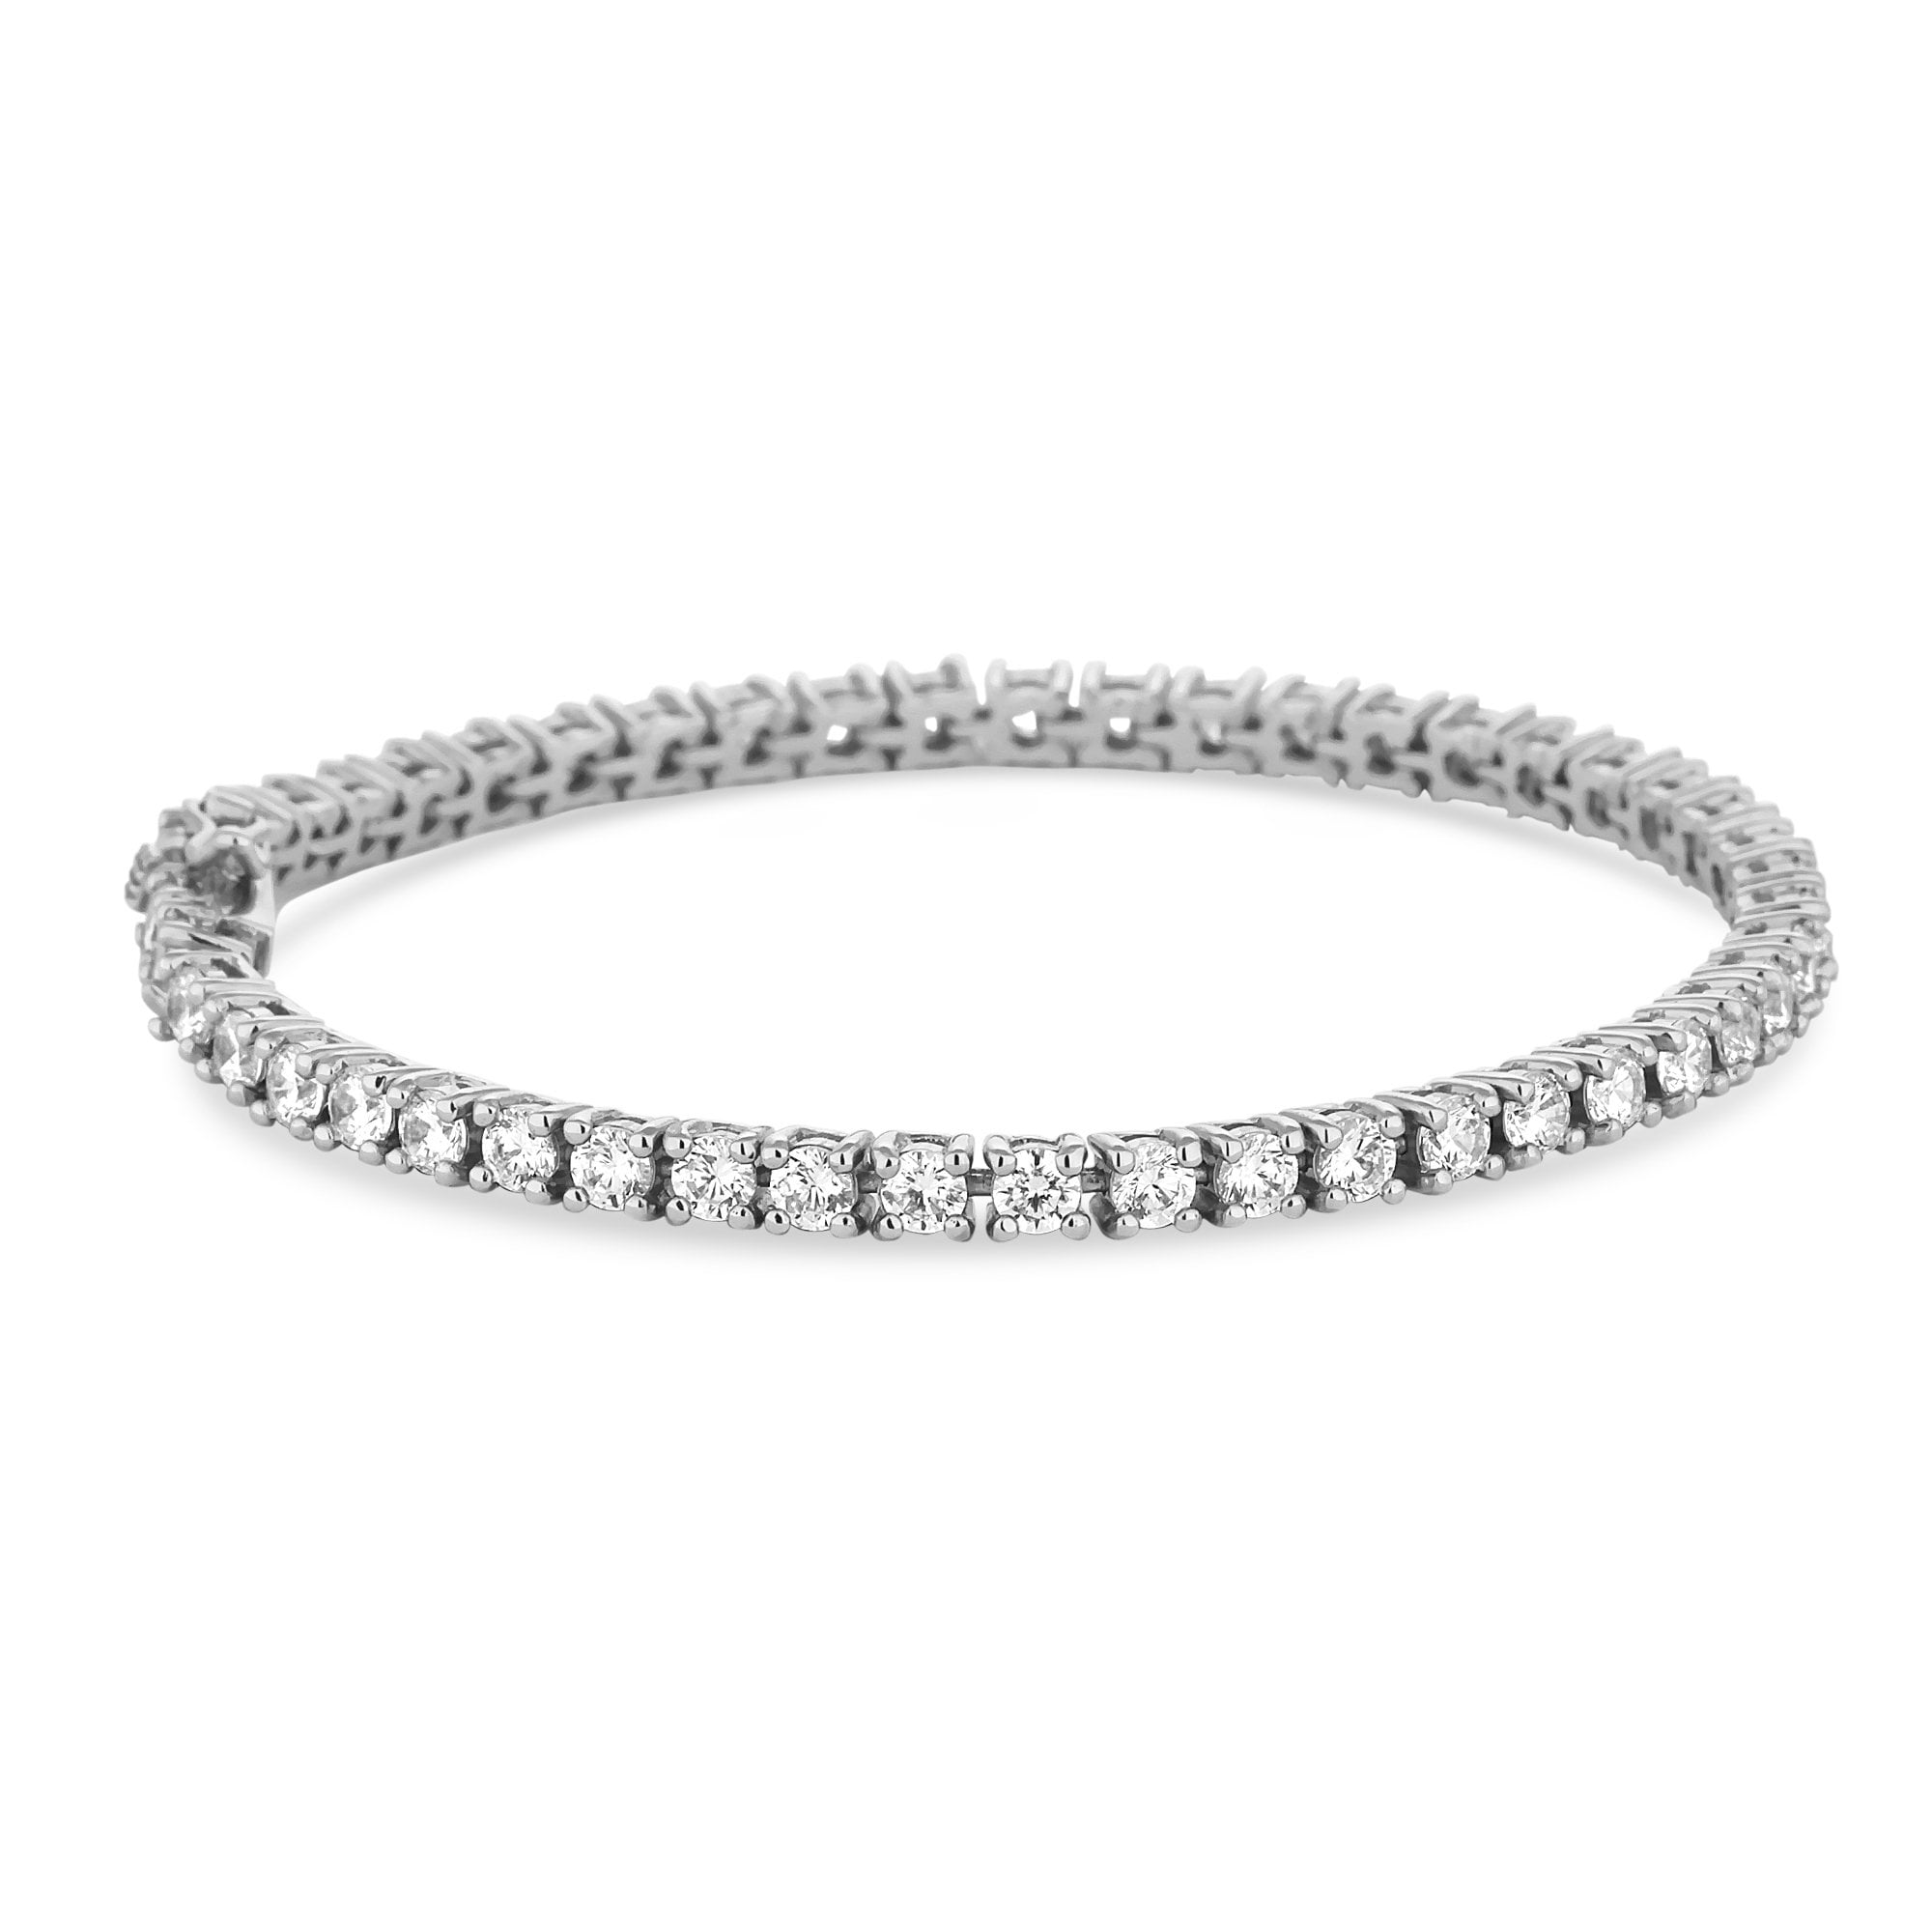 Simply Silver Sterling Cubic Zirconia Tennis Bracelet